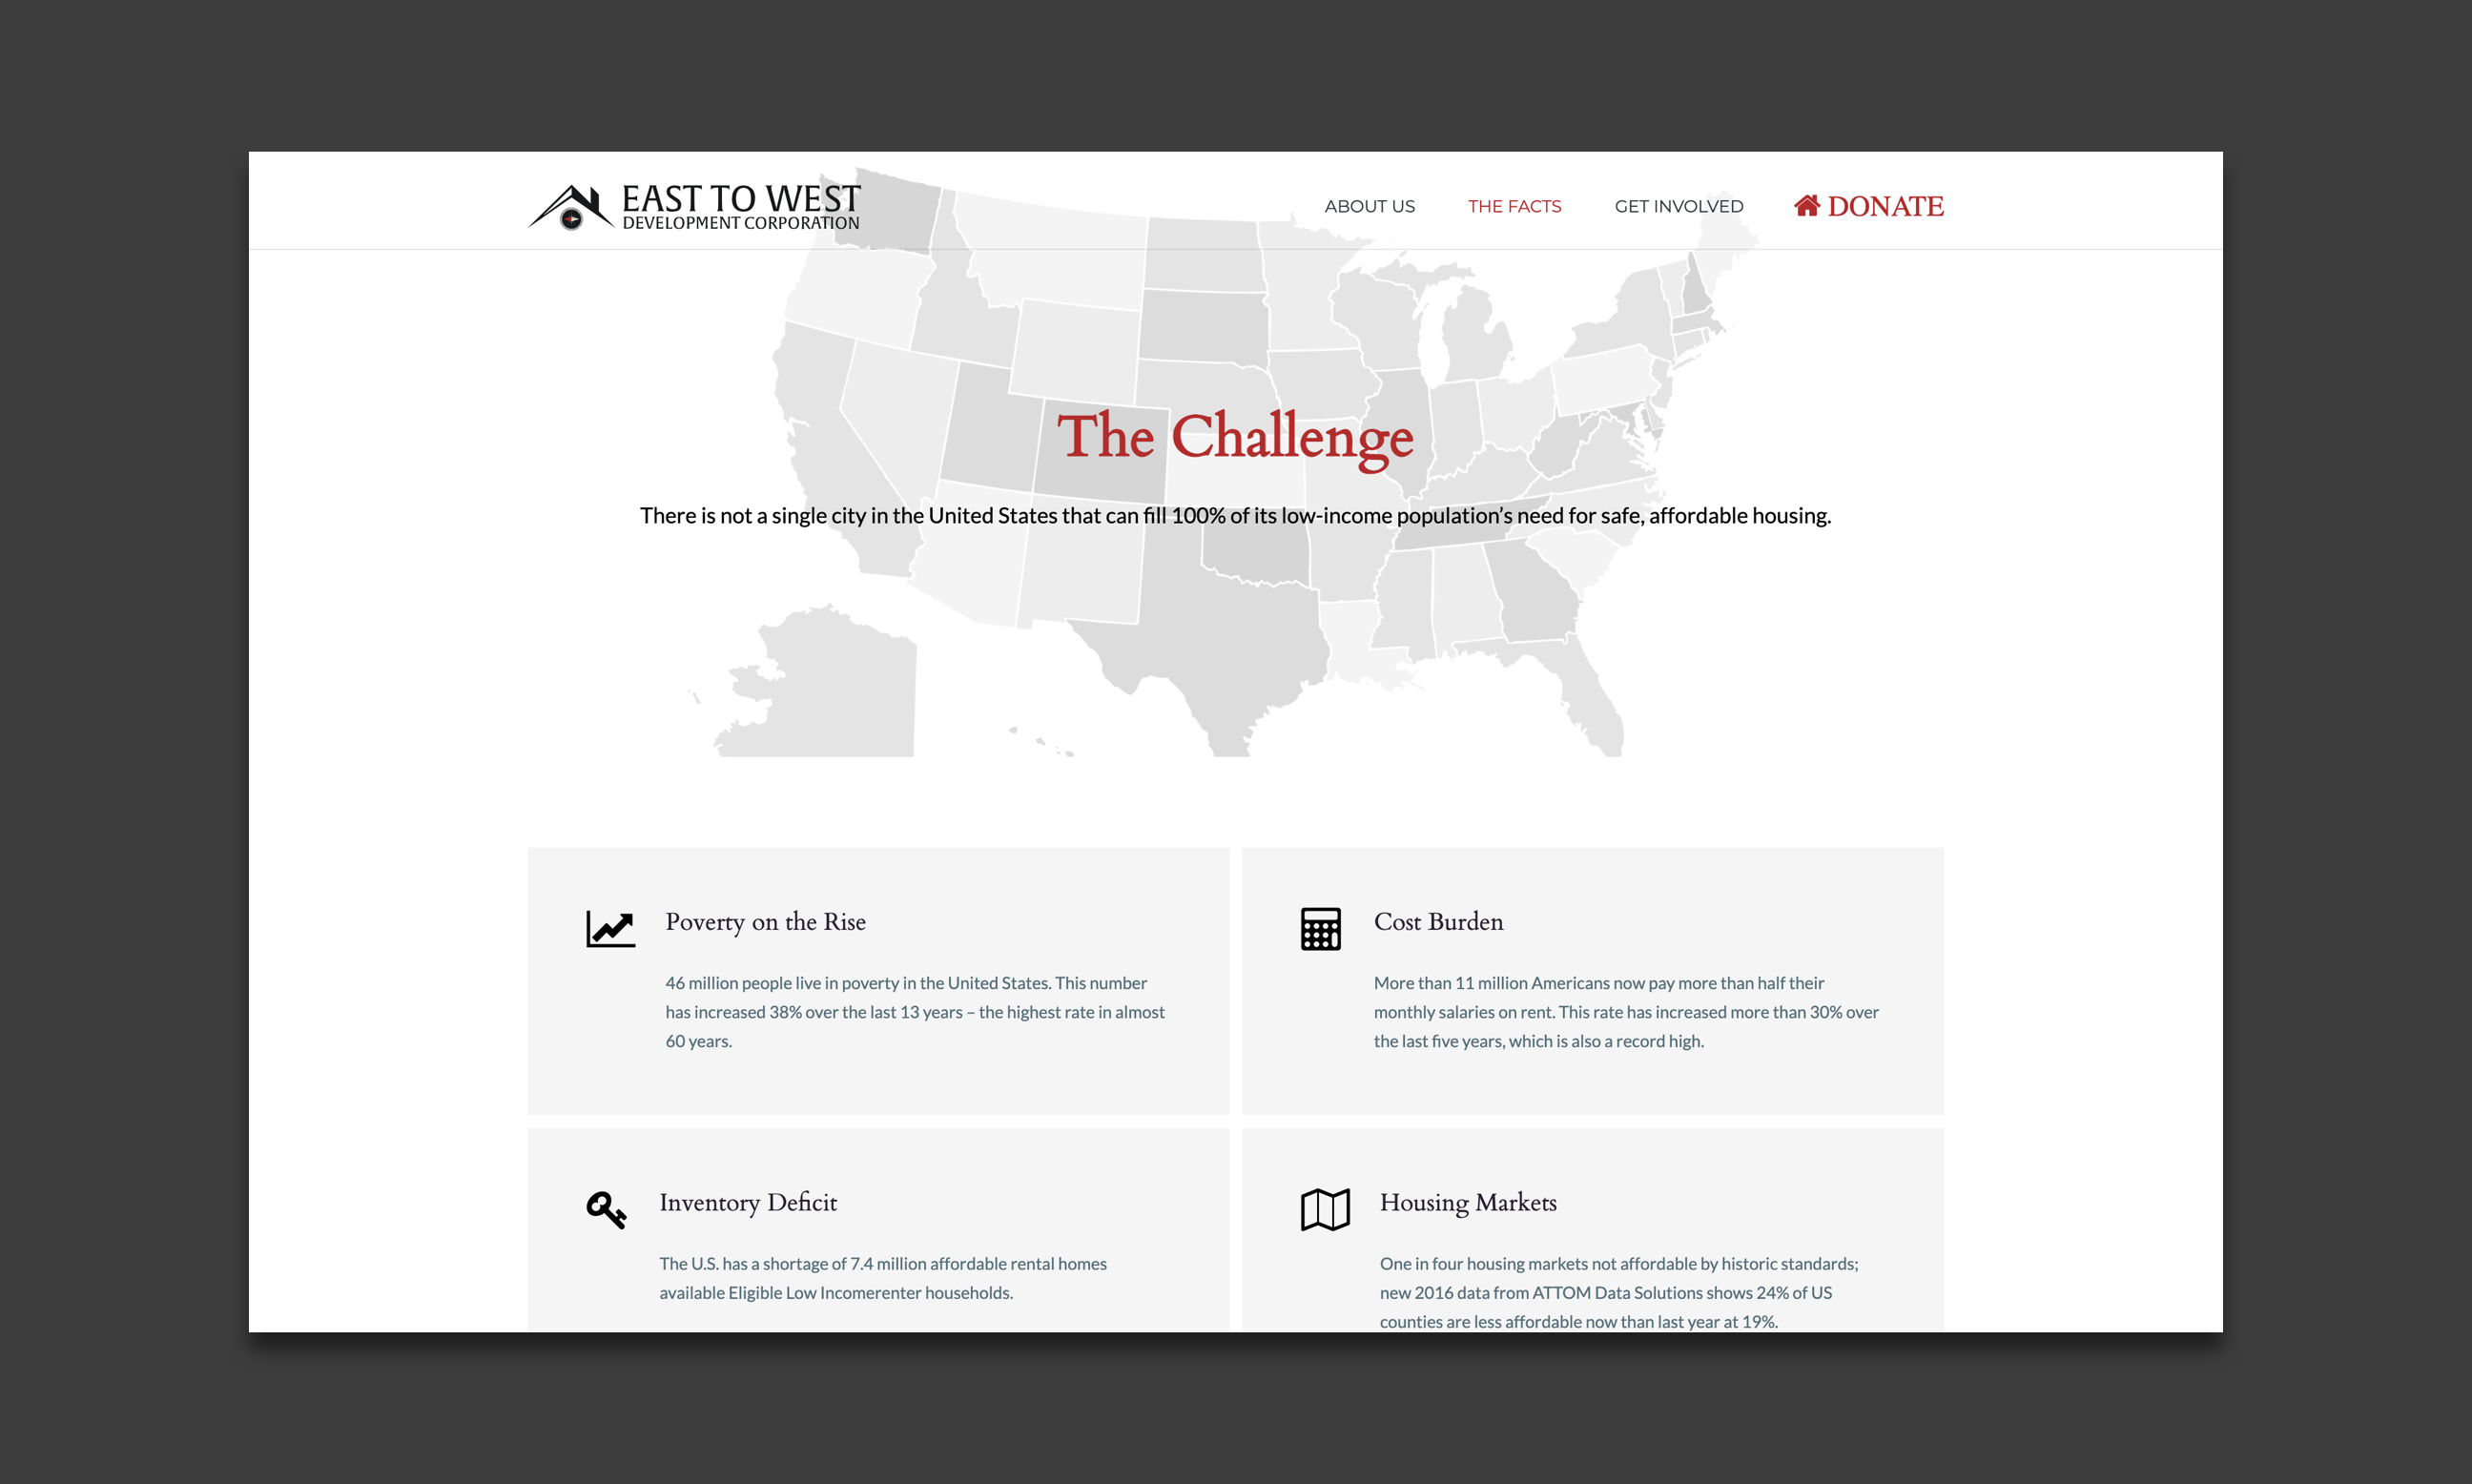 The challenge screengrab